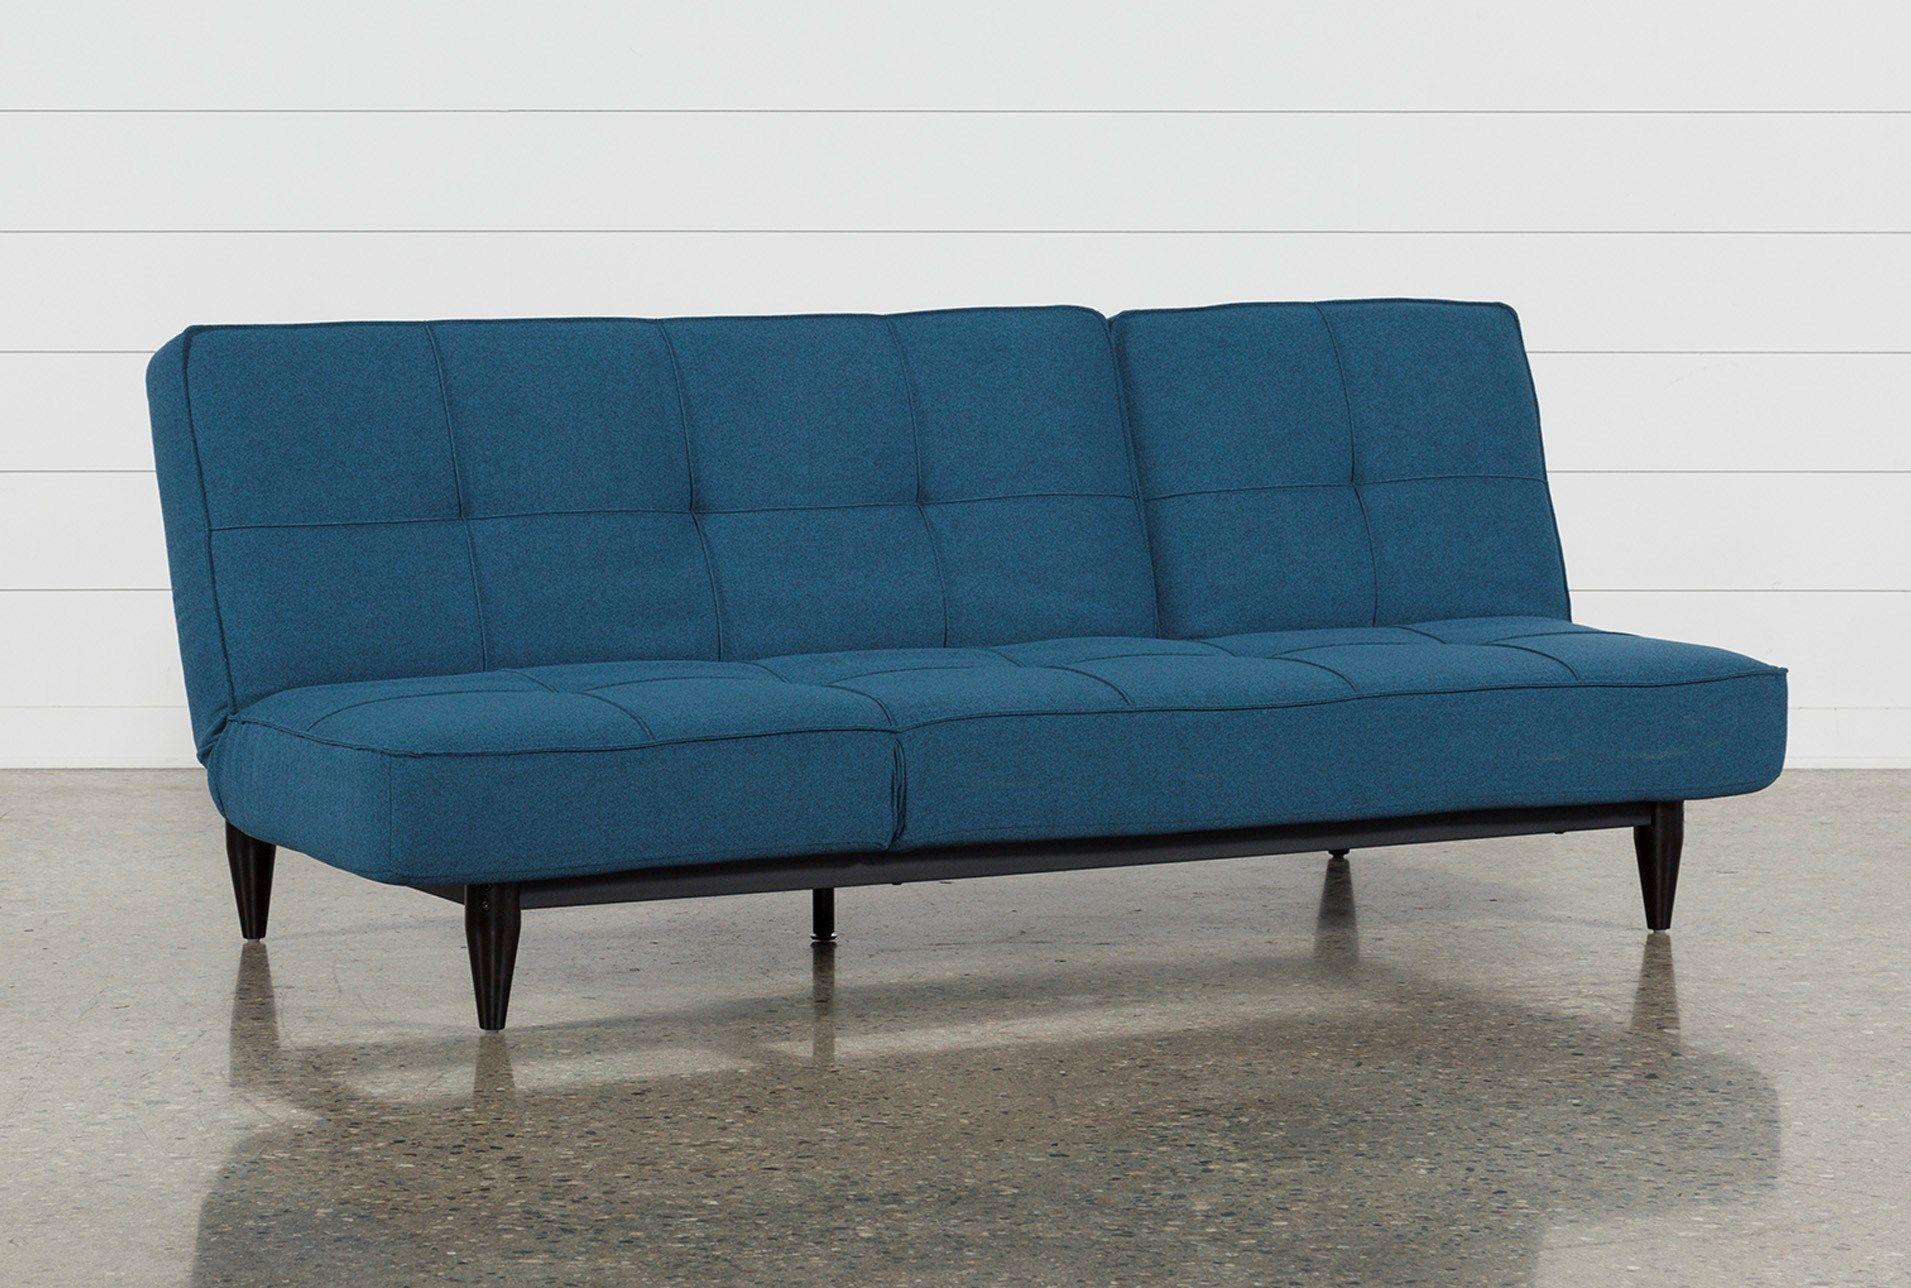 Paige Blue Convertible Sofa Chaise Sleeper Chaise Sofa Convertible Sofa Classic Sofa Bed